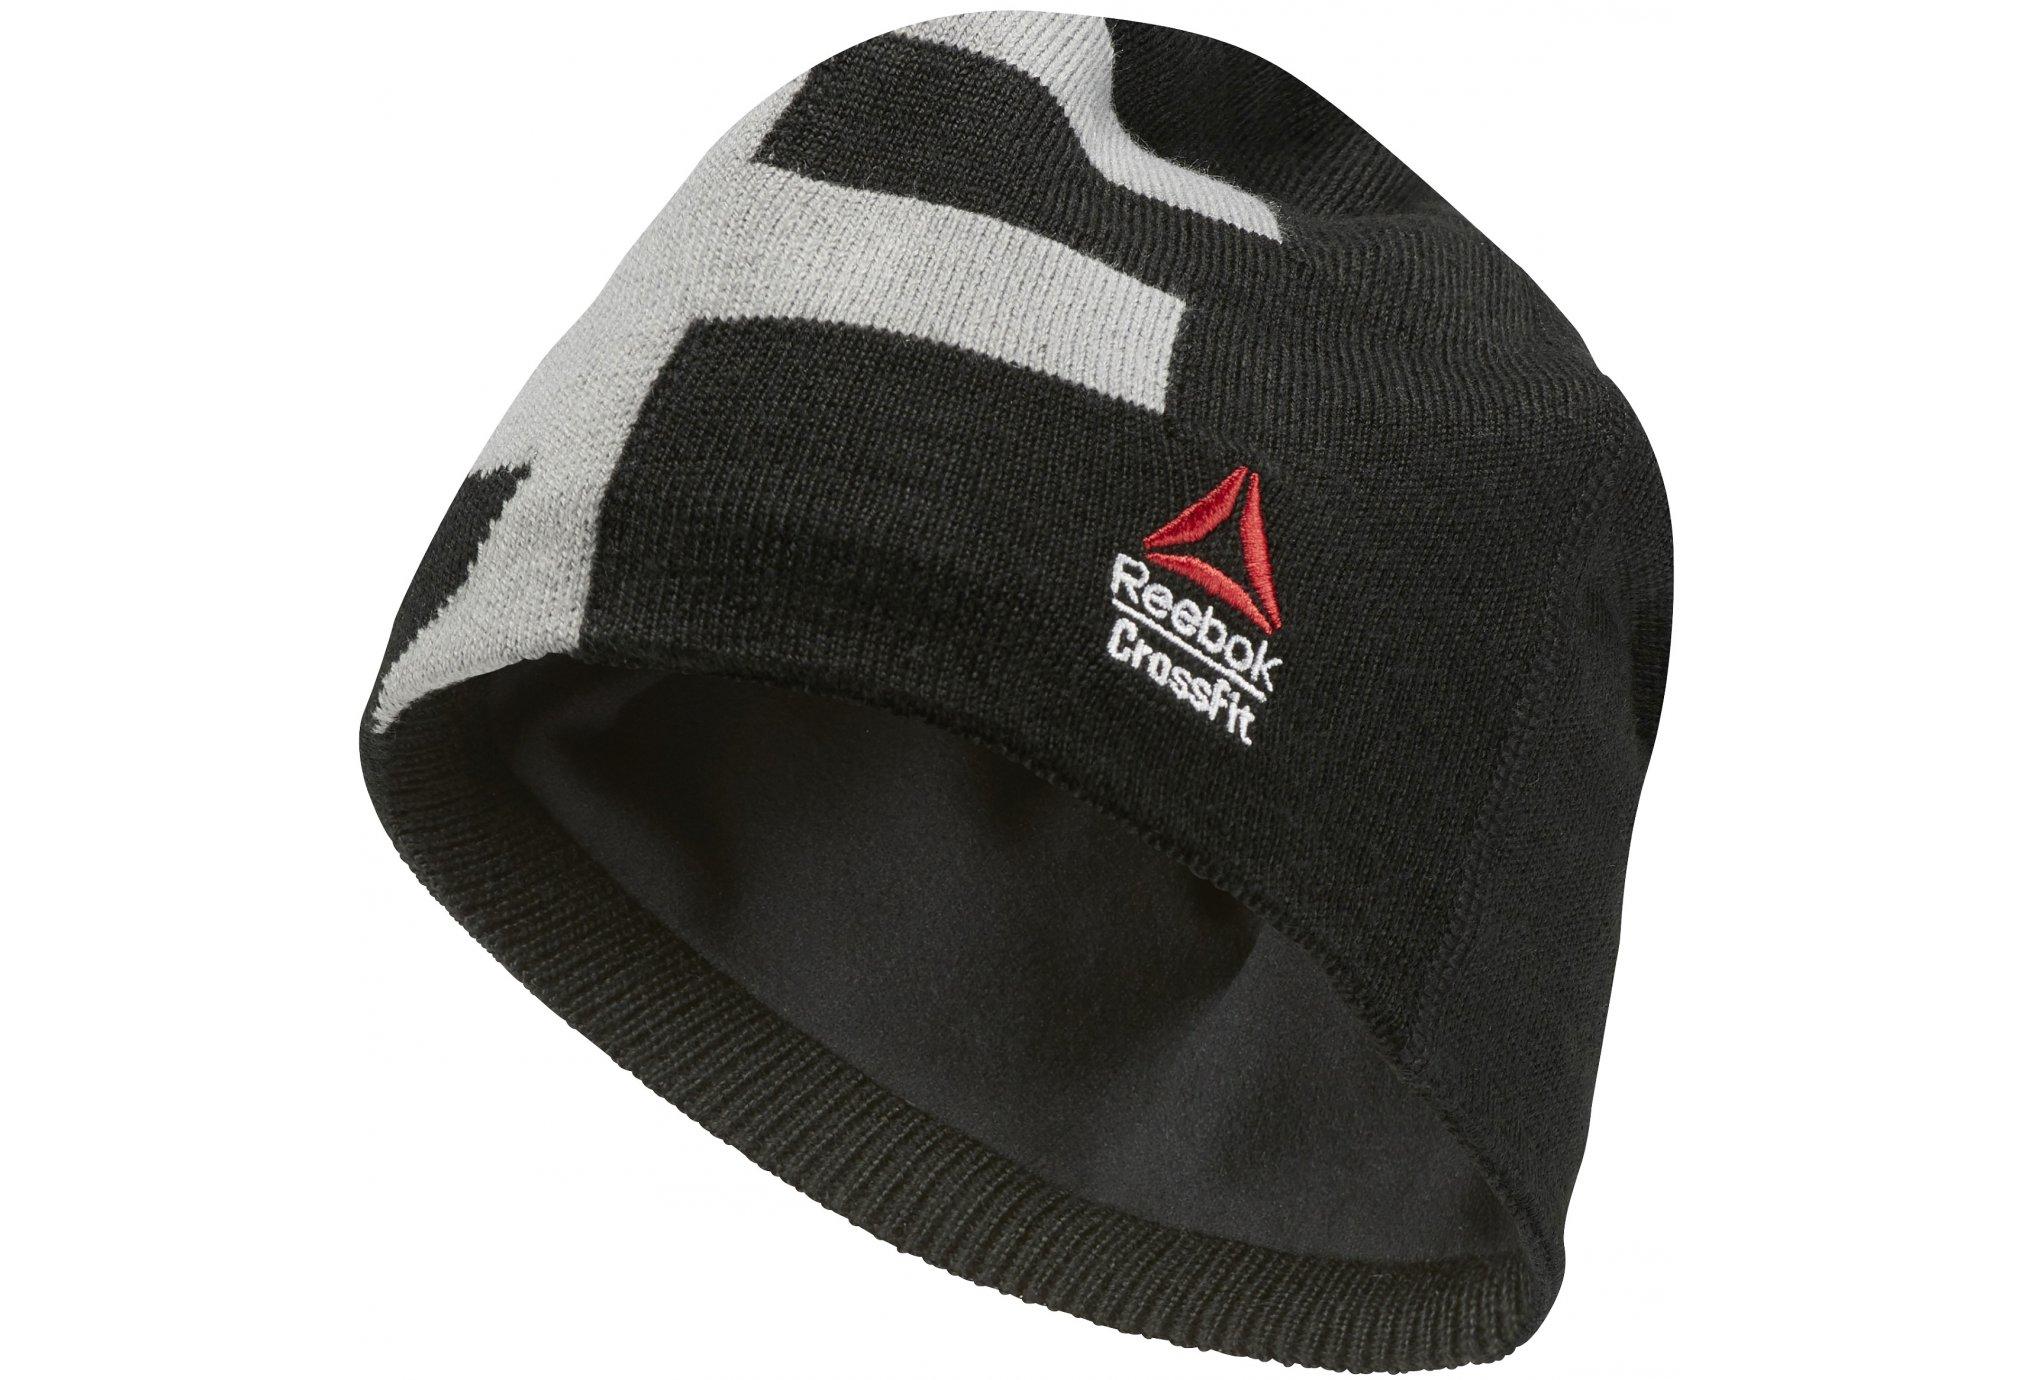 Reebok Crossfit Perforated Bonnets / Gants